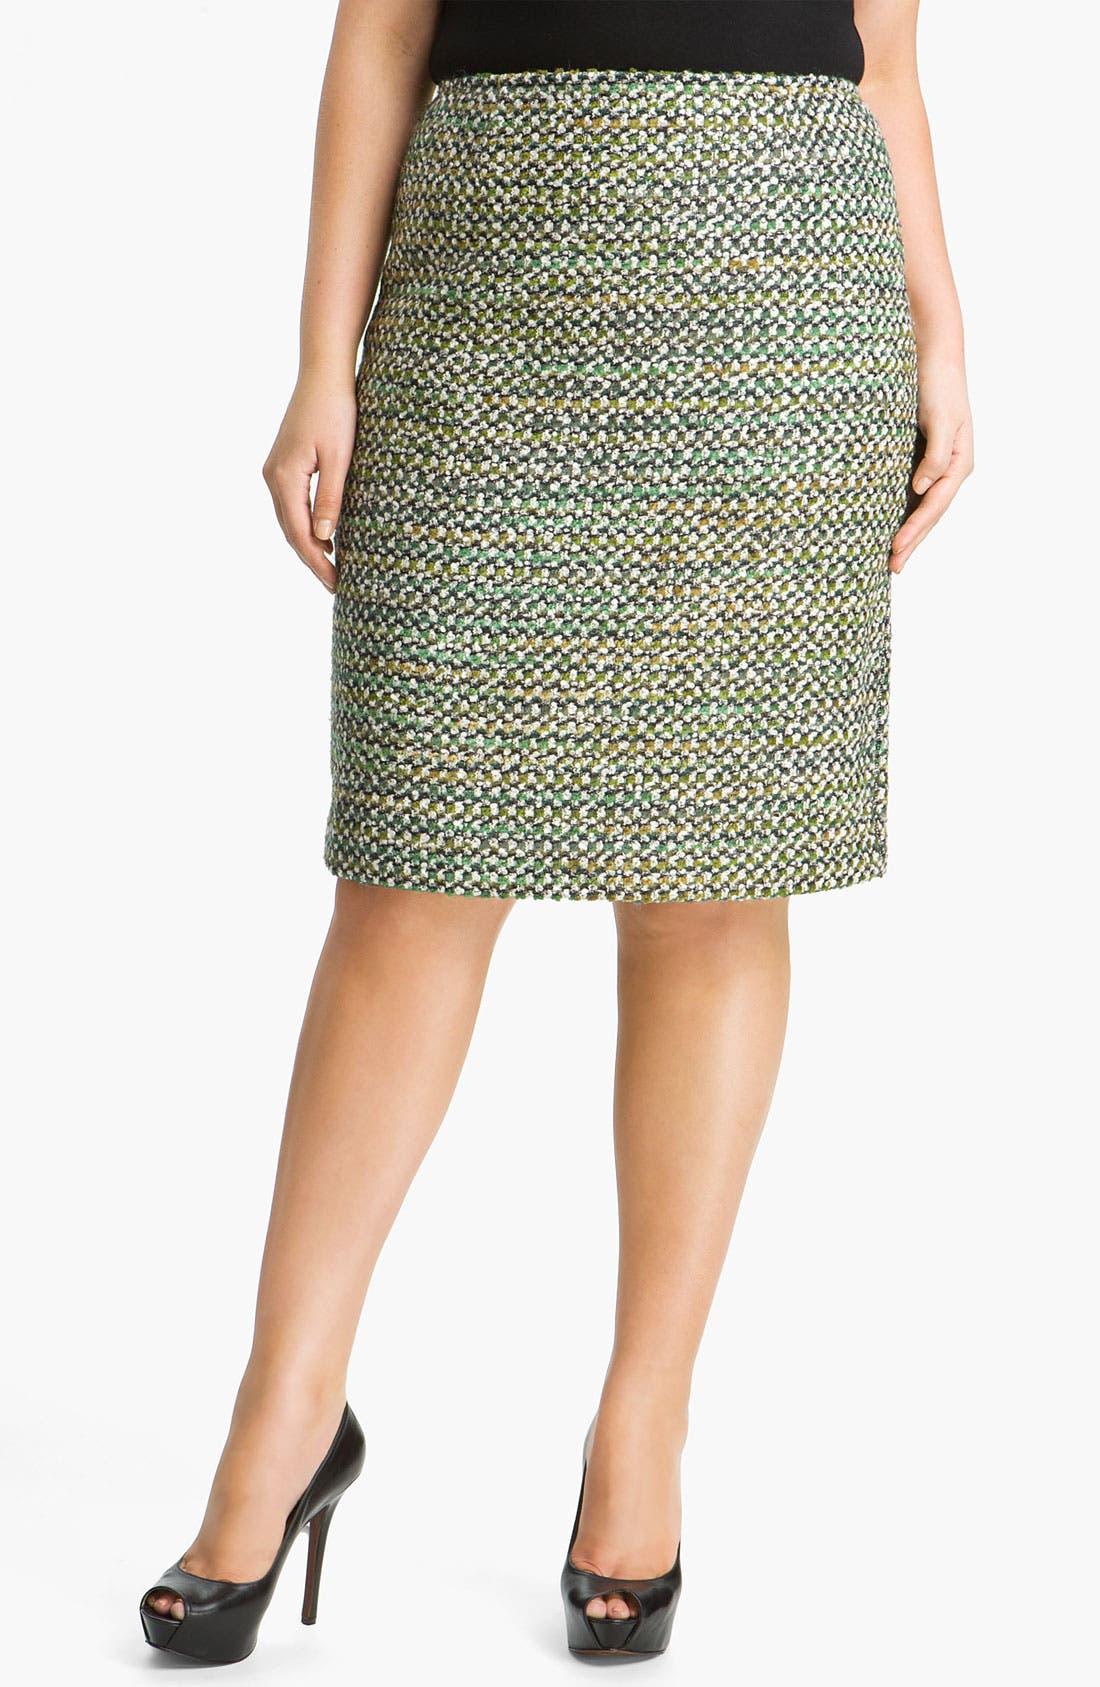 Alternate Image 1 Selected - Lafayette 148 New York 'Hierarchy' Tweed Skirt (Plus)